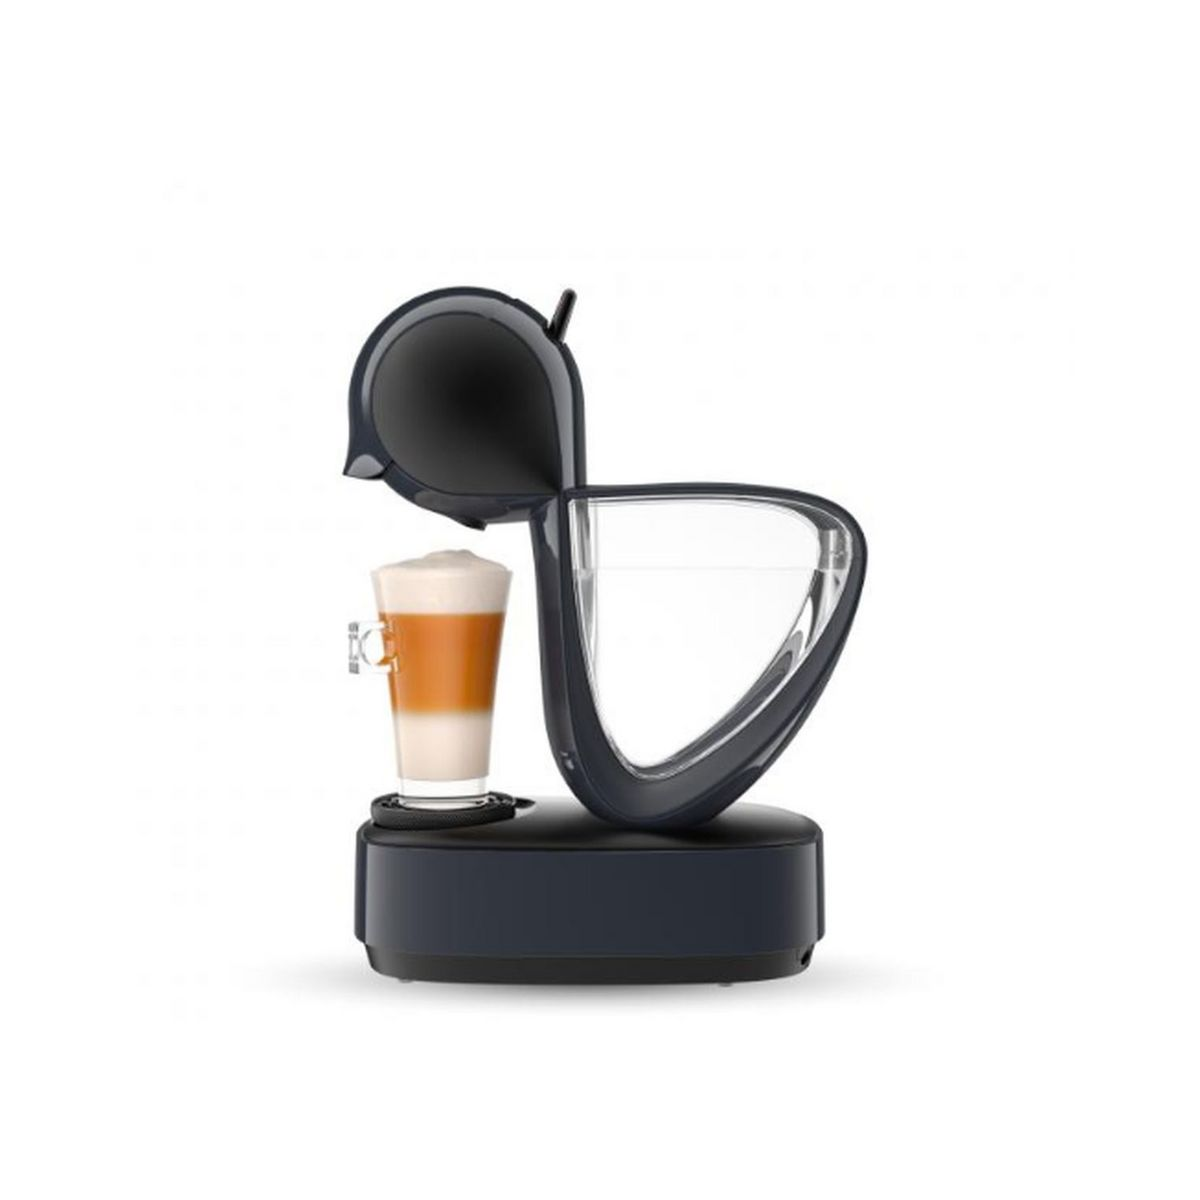 Cafetière à dosette Dolce Gusto - YY4230FD - Anthracite